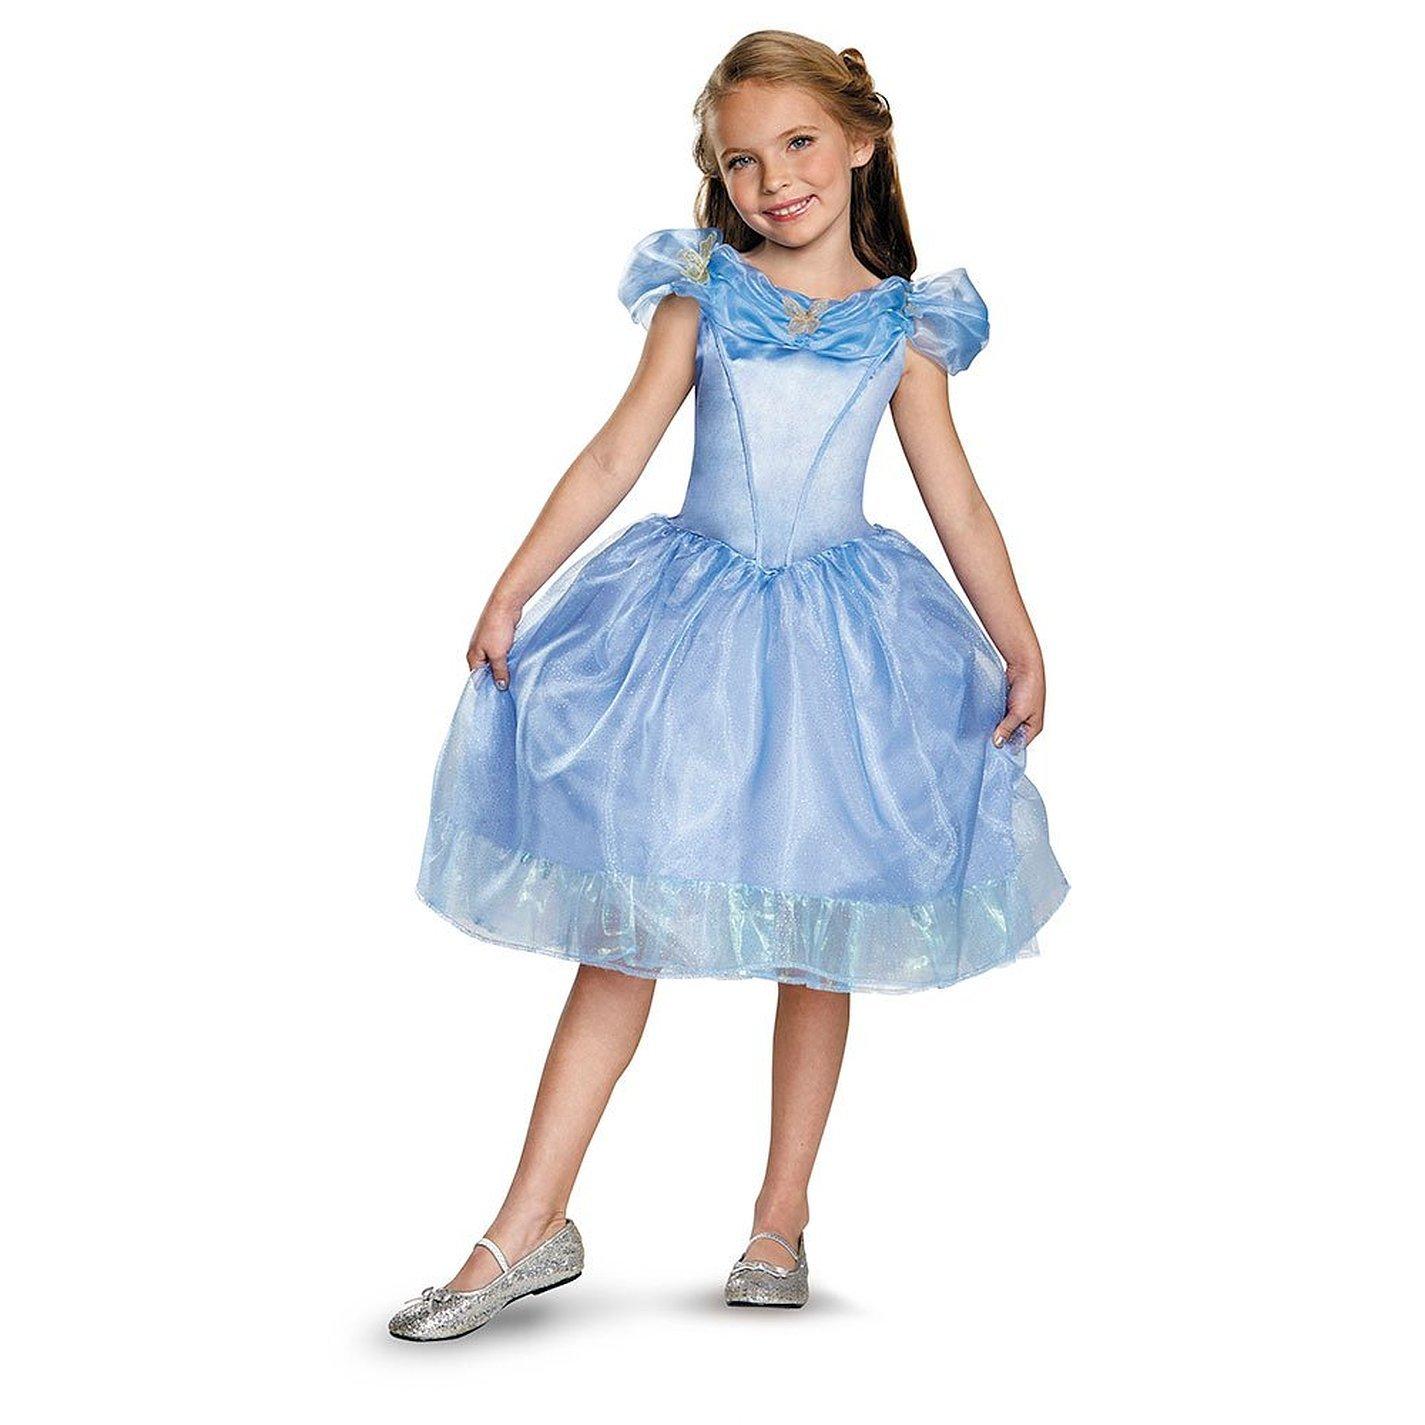 Amazon.com Disguise Cinderella Movie Classic Costume Large (10-12) Toys u0026 Games  sc 1 st  Amazon.com & Amazon.com: Disguise Cinderella Movie Classic Costume Large (10-12 ...